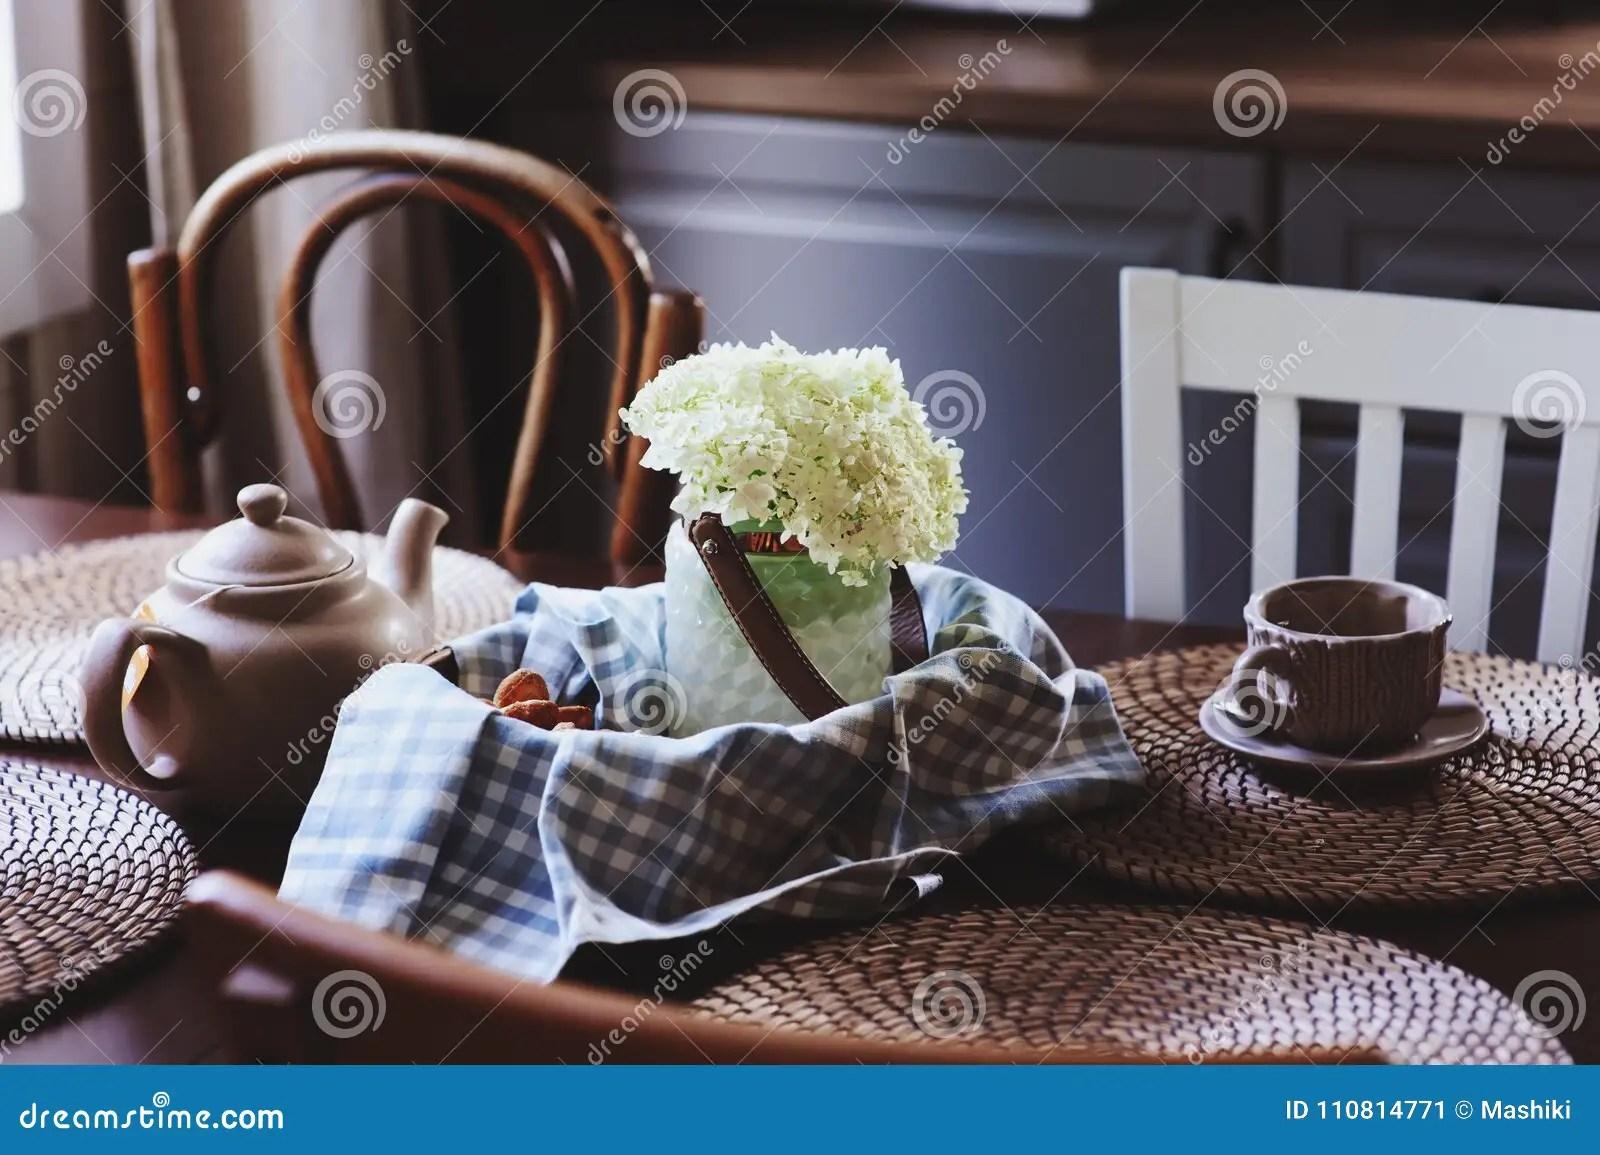 summer kitchens portable kitchen islands 在土气乡间别墅厨房的舒适夏天早晨库存图片 图片包括有增长 咖啡 概念 在土气乡间别墅厨房的舒适夏天早晨